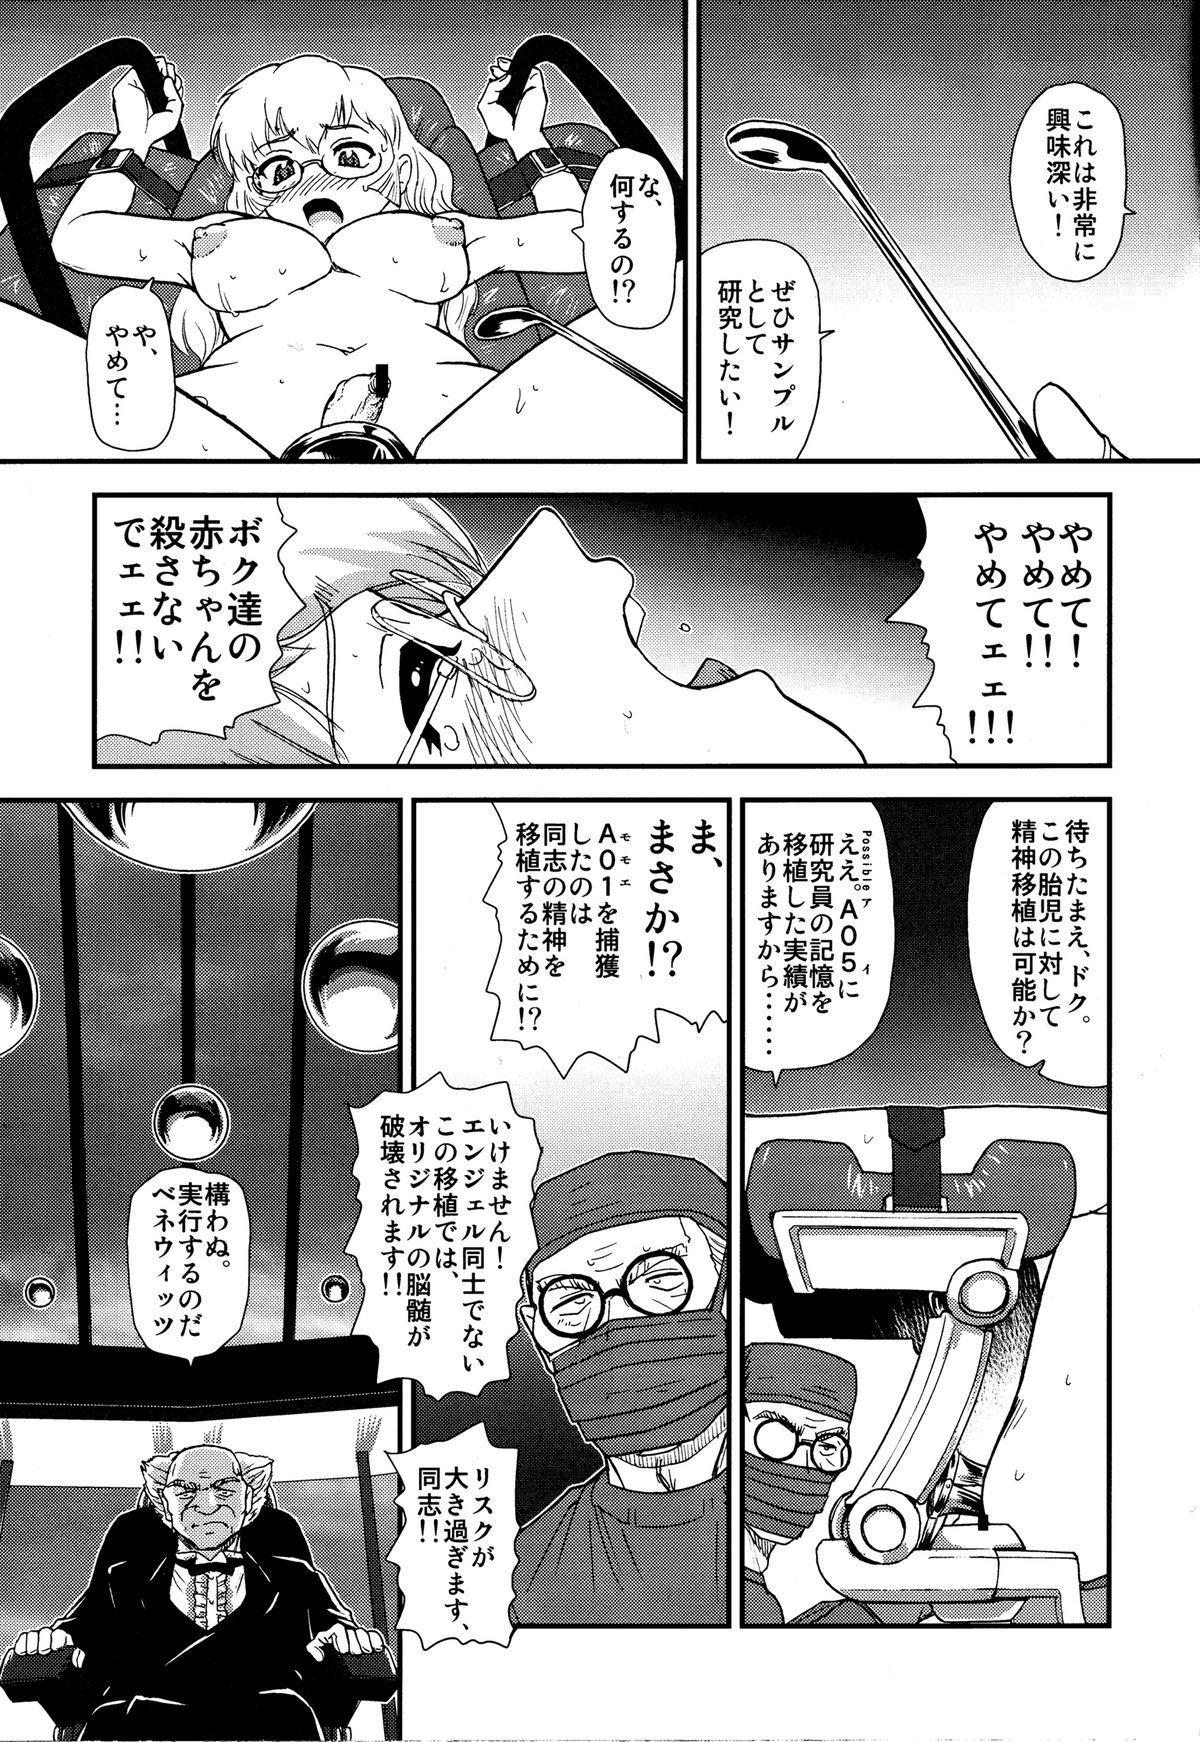 Dulce Report 14 13